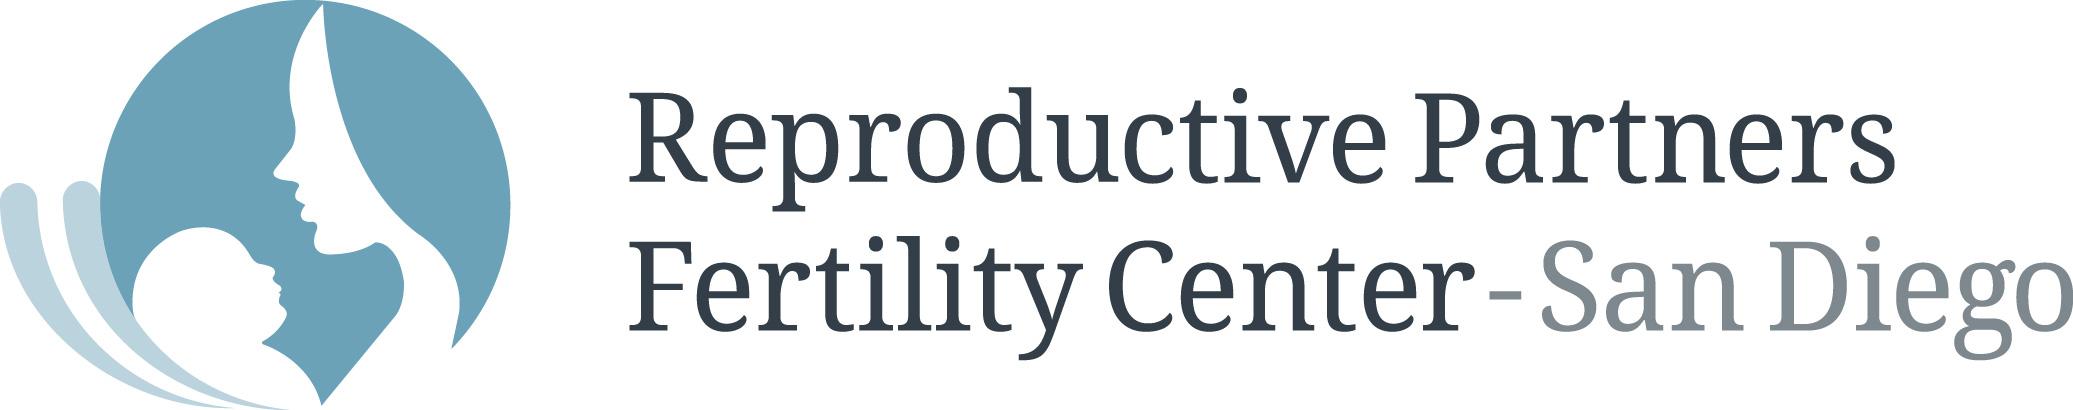 Reproductive Partners Fertility Center - San Diego